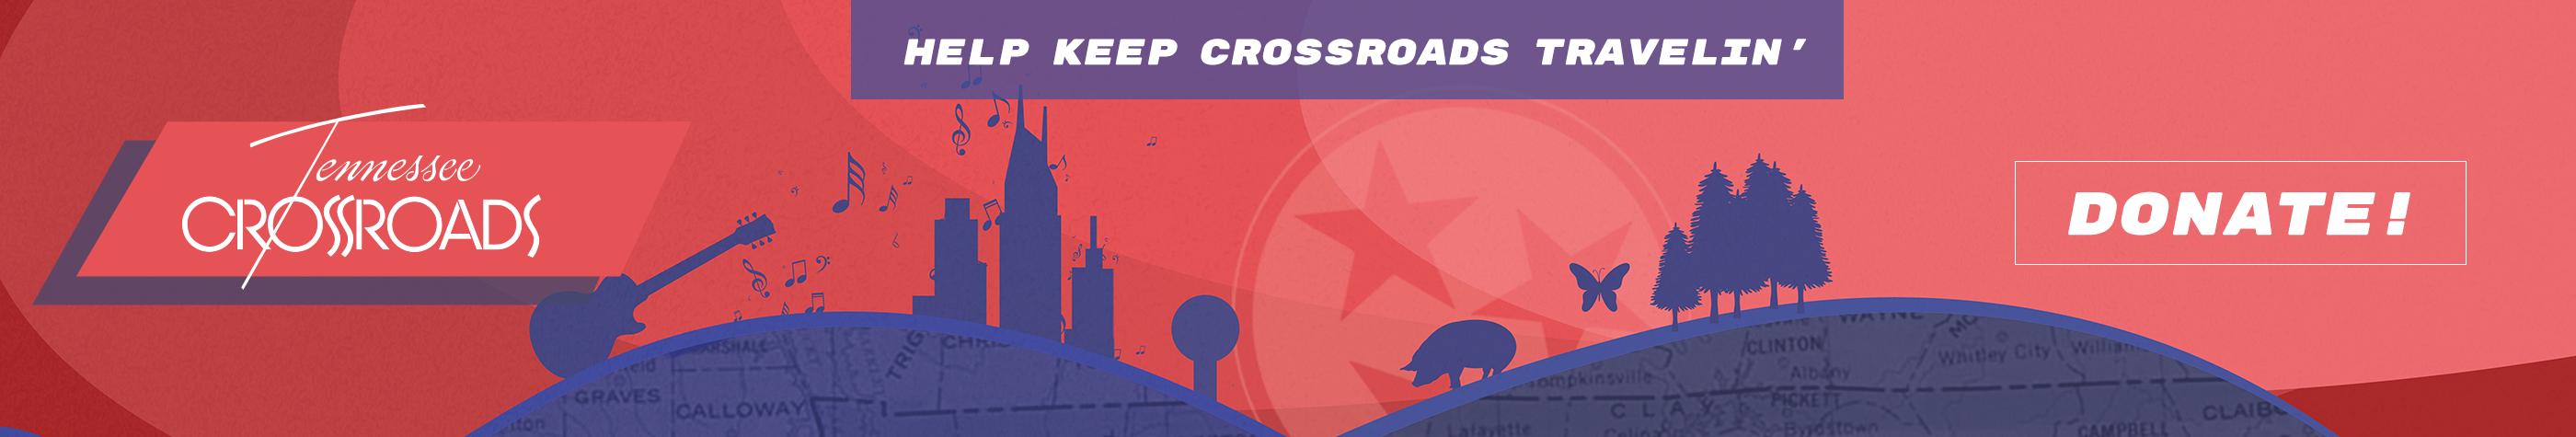 Donate and Help Keep Crossroads Travelin'